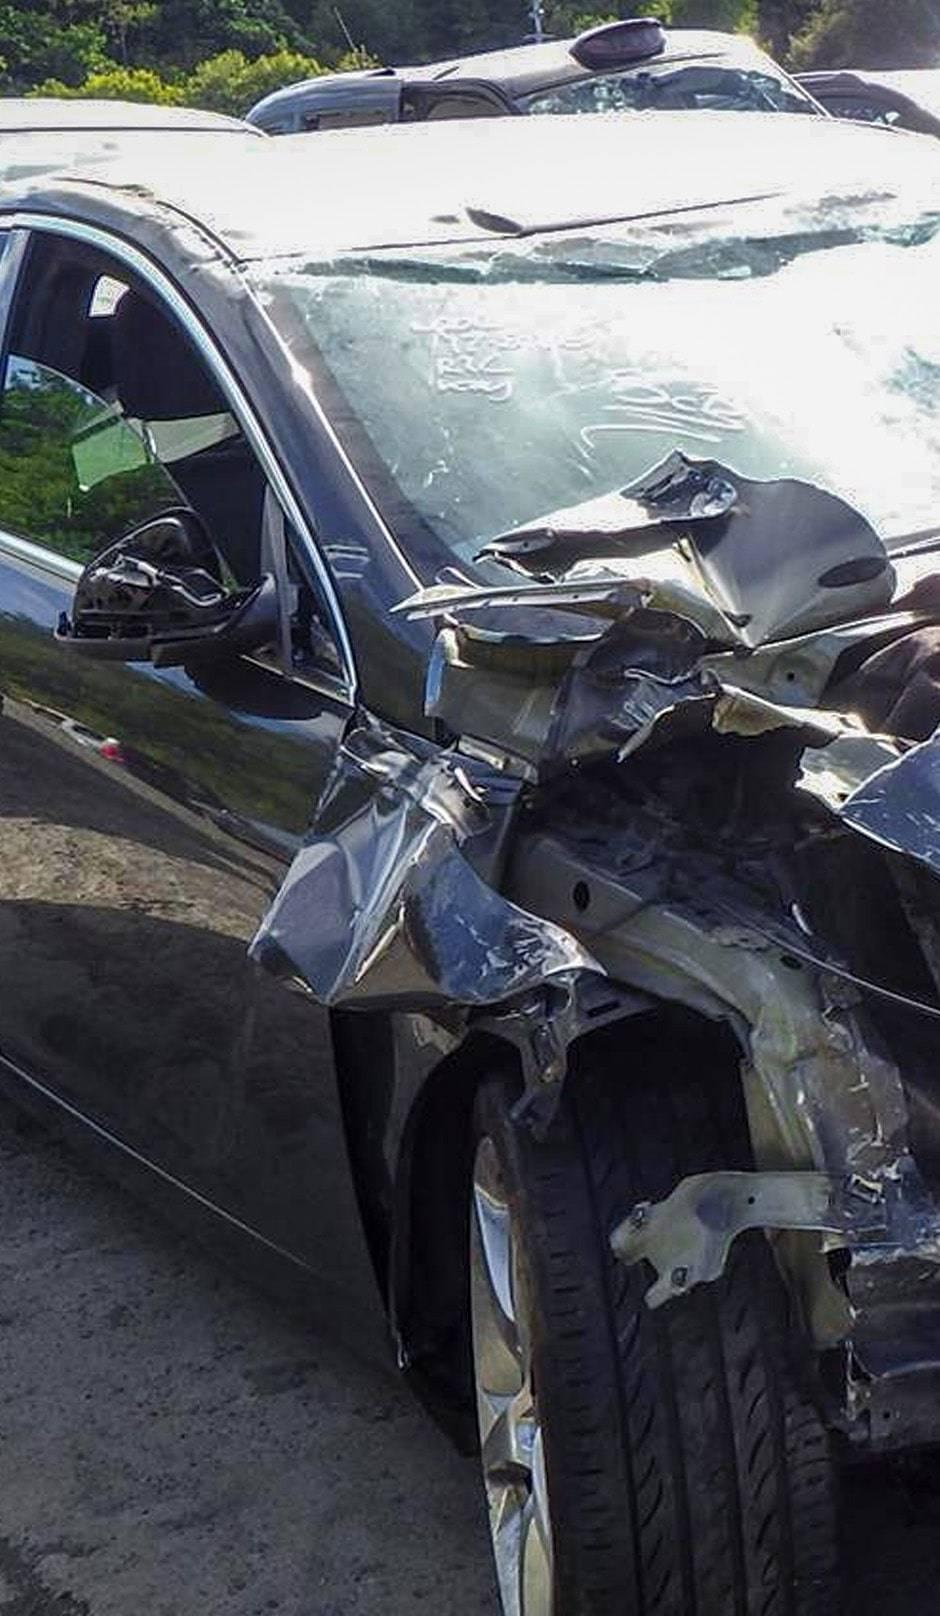 Scrap my Vauxhall car